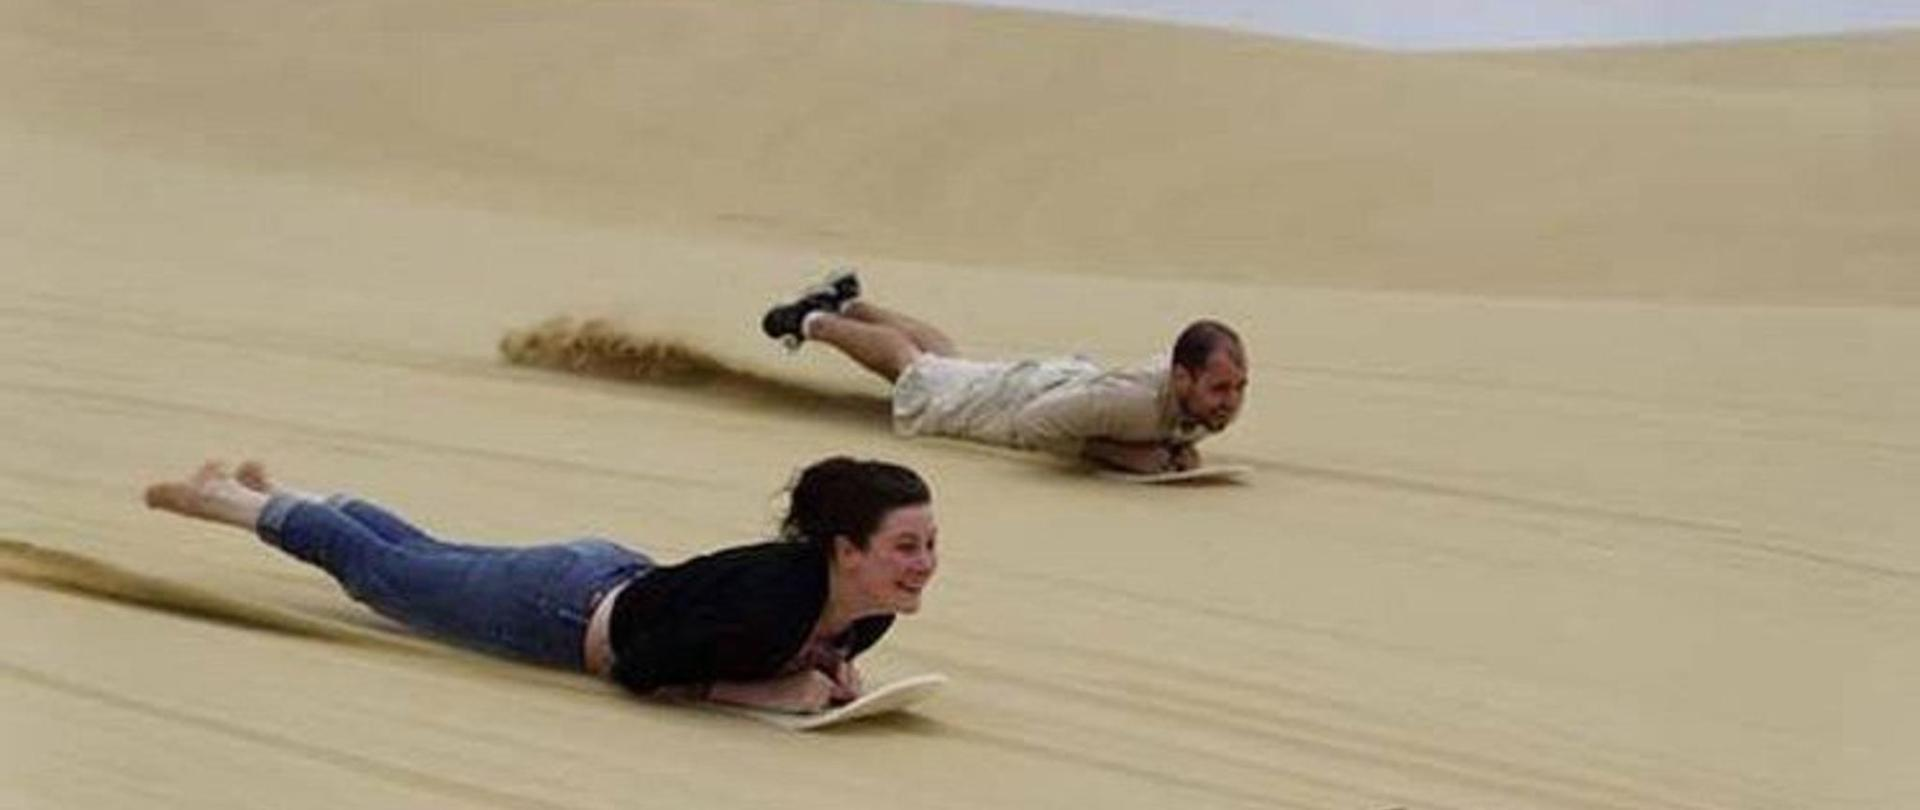 belly-sandboarding3-1.jpg